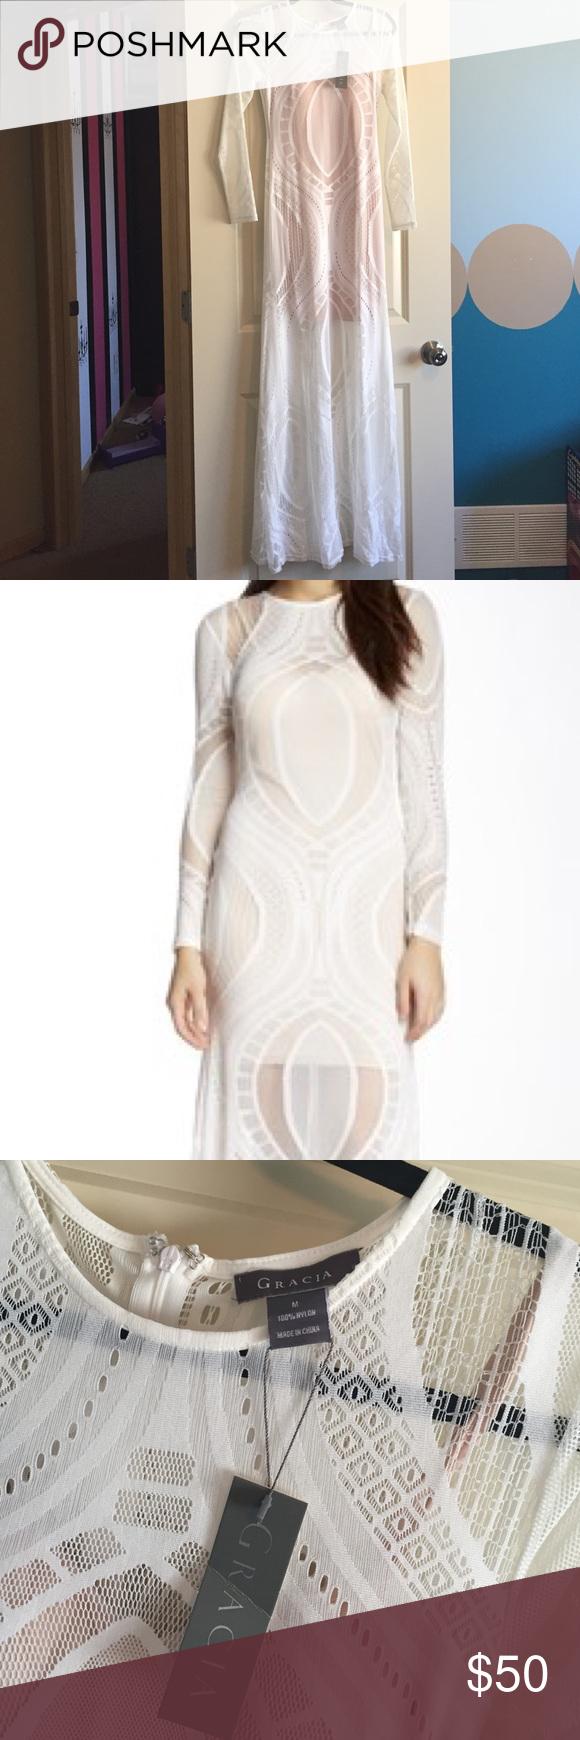 Nwt long sleeve maxi dress beautiful detailed design has a nude